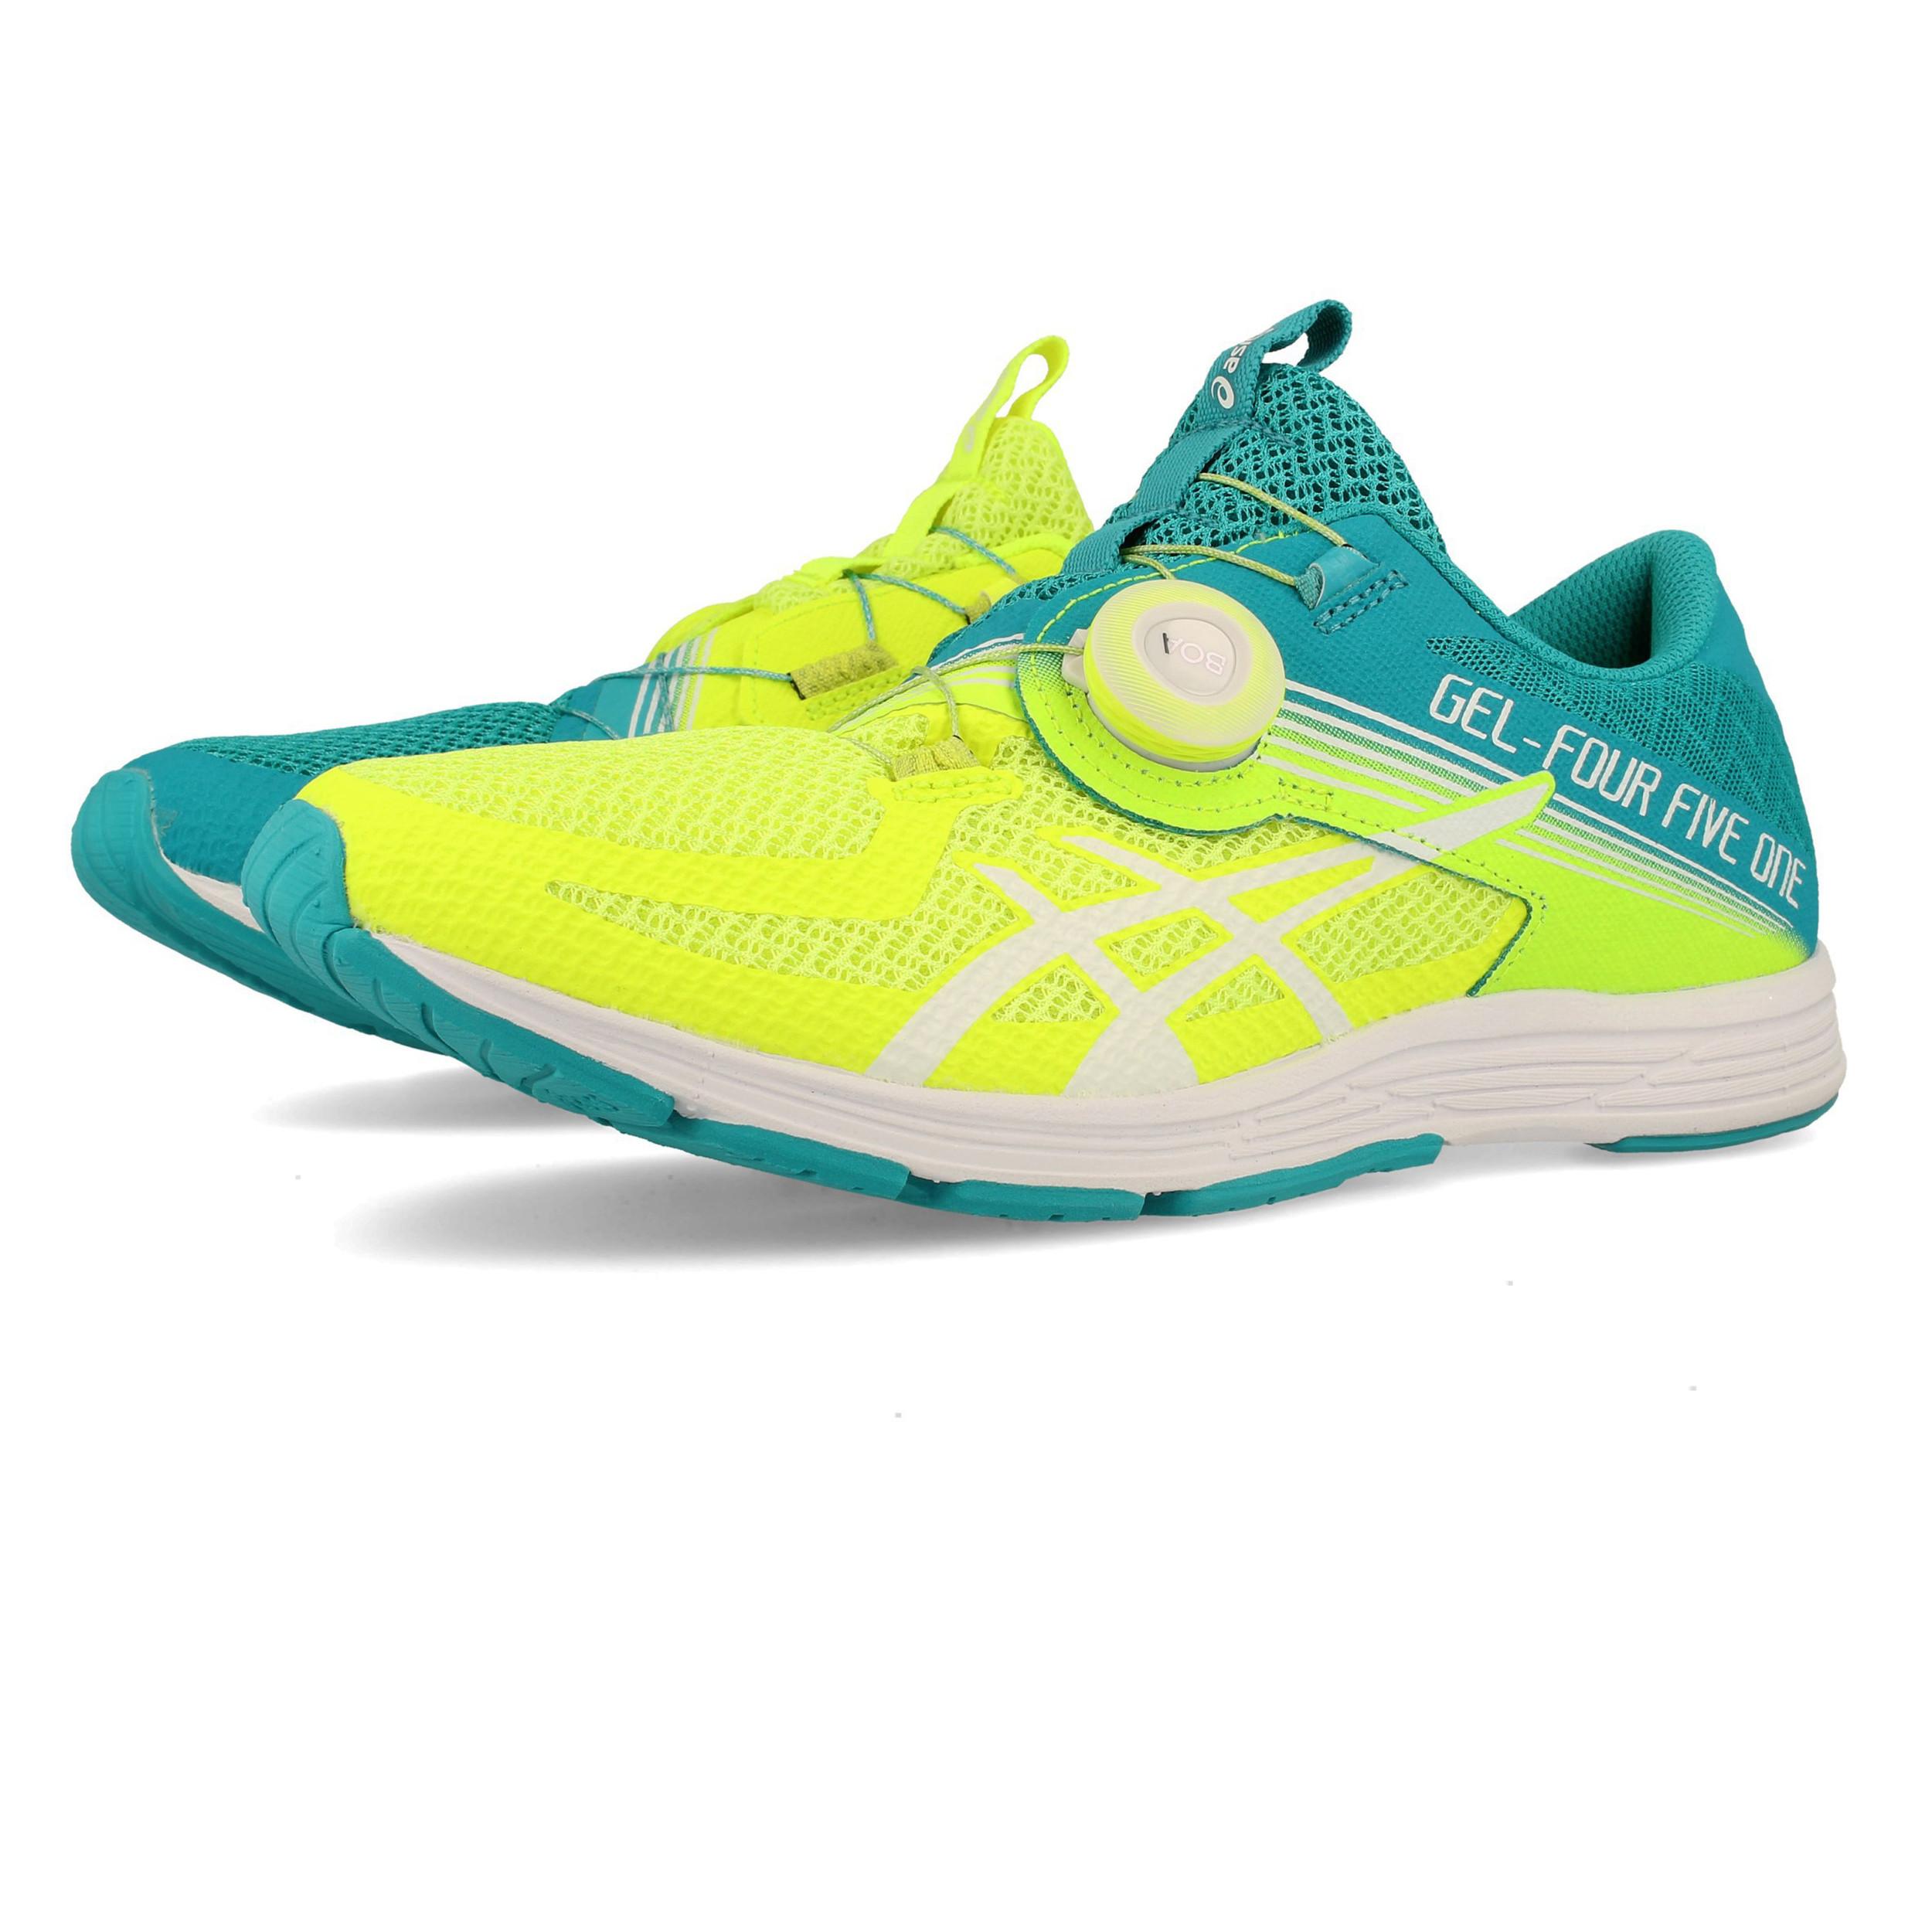 Detalles de Asics Mujer Gel 451 Correr Zapatos Zapatillas Azul Amarillo Deporte Entrenar